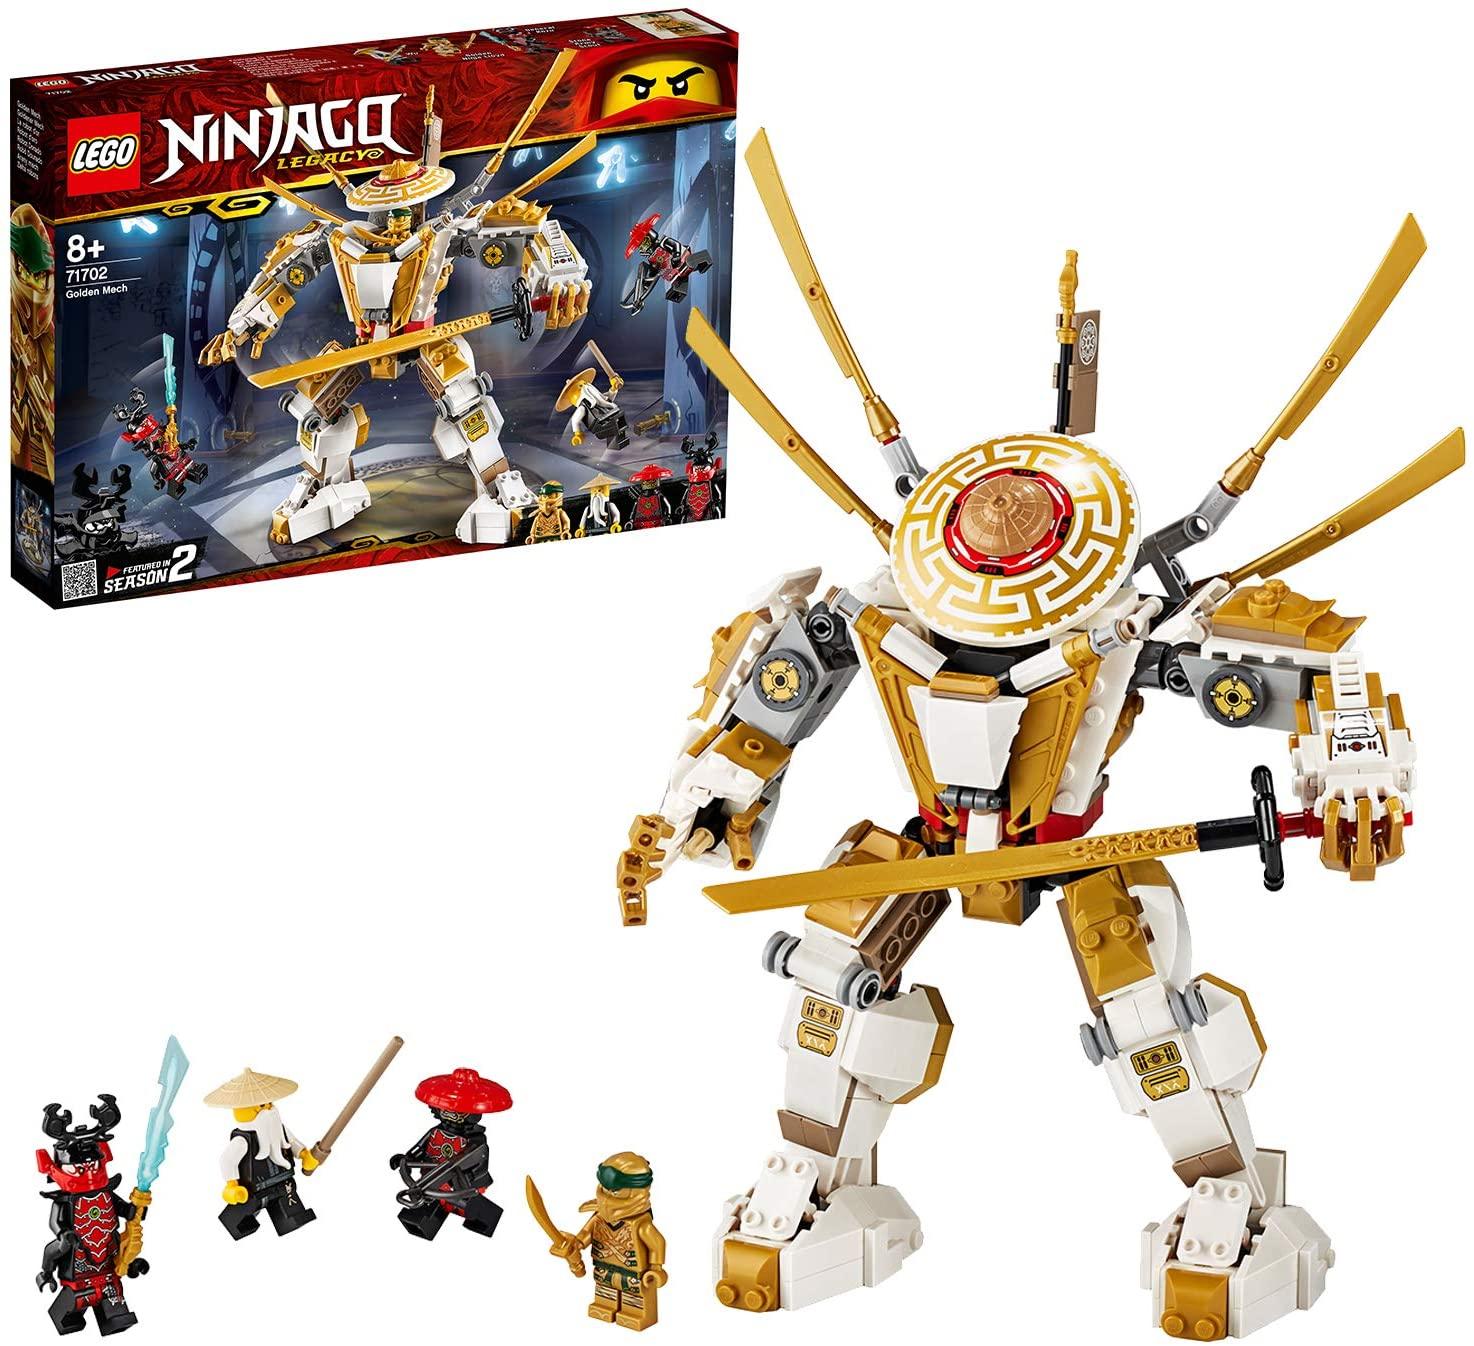 LEGO 71702 NINJAGO Legacy Golden Mech £27.99 delivered at Amazon